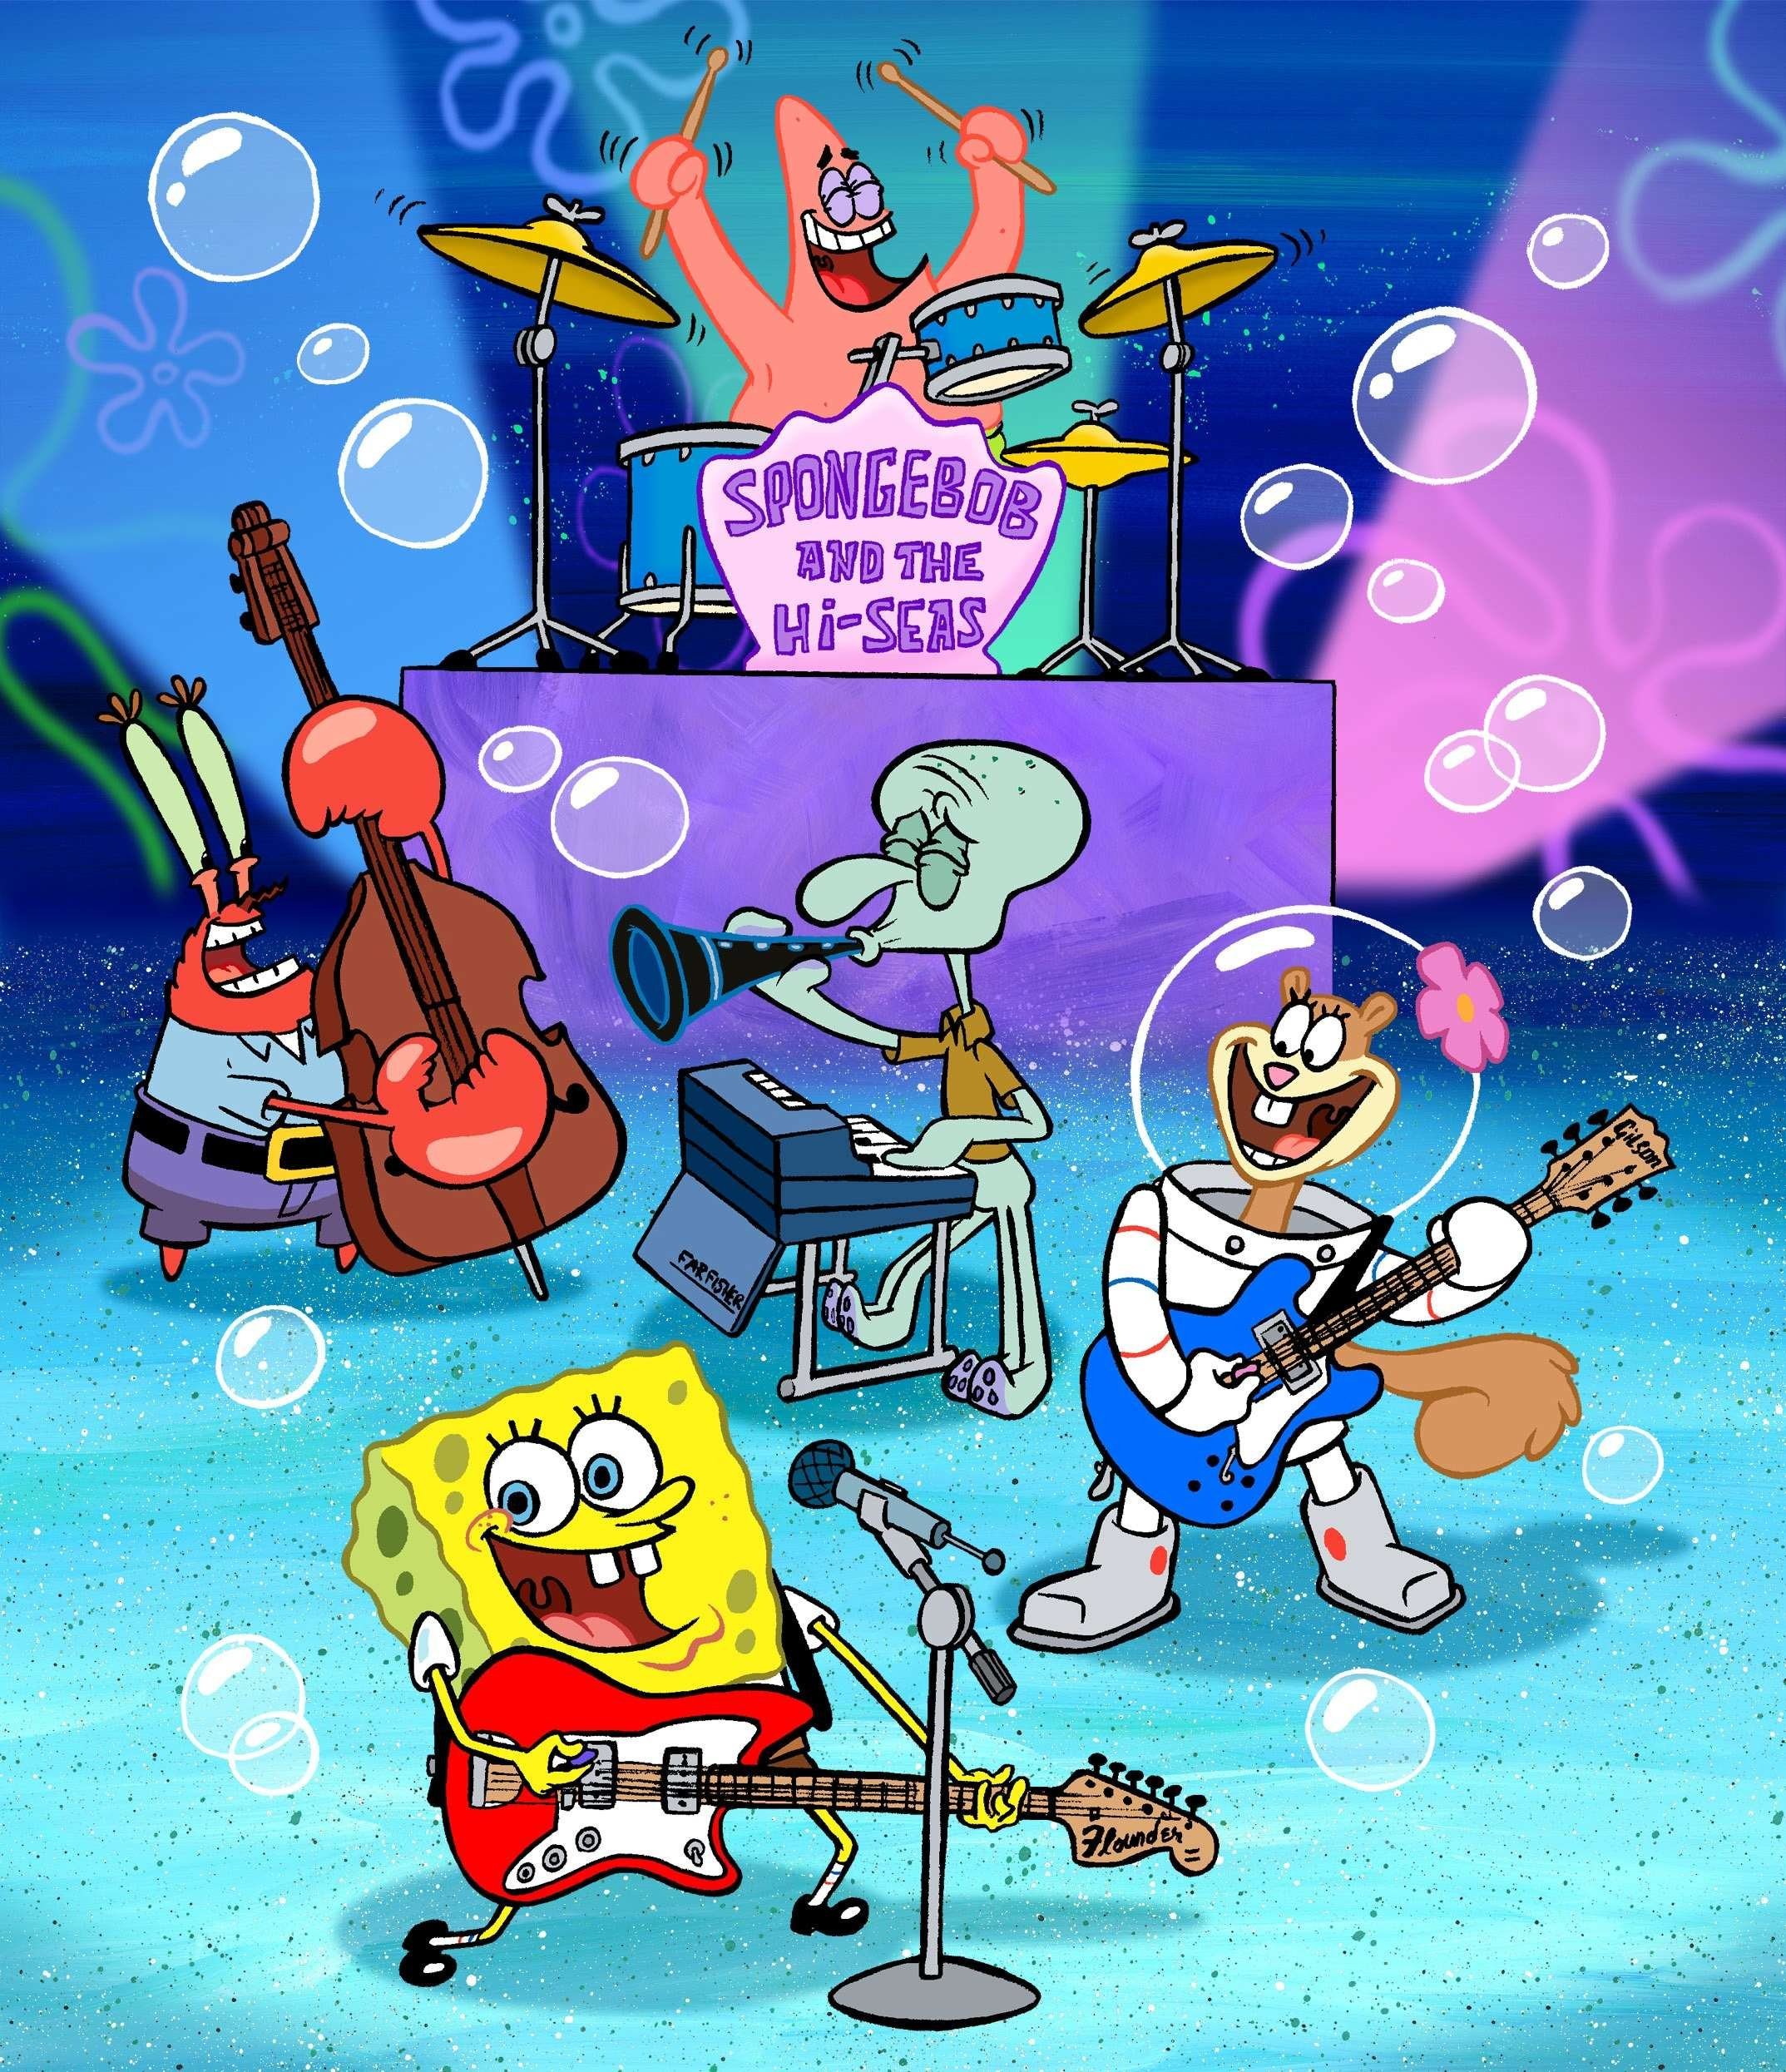 Spongebob s band wallpaper spongebob squarepants 40592830 2147 2491